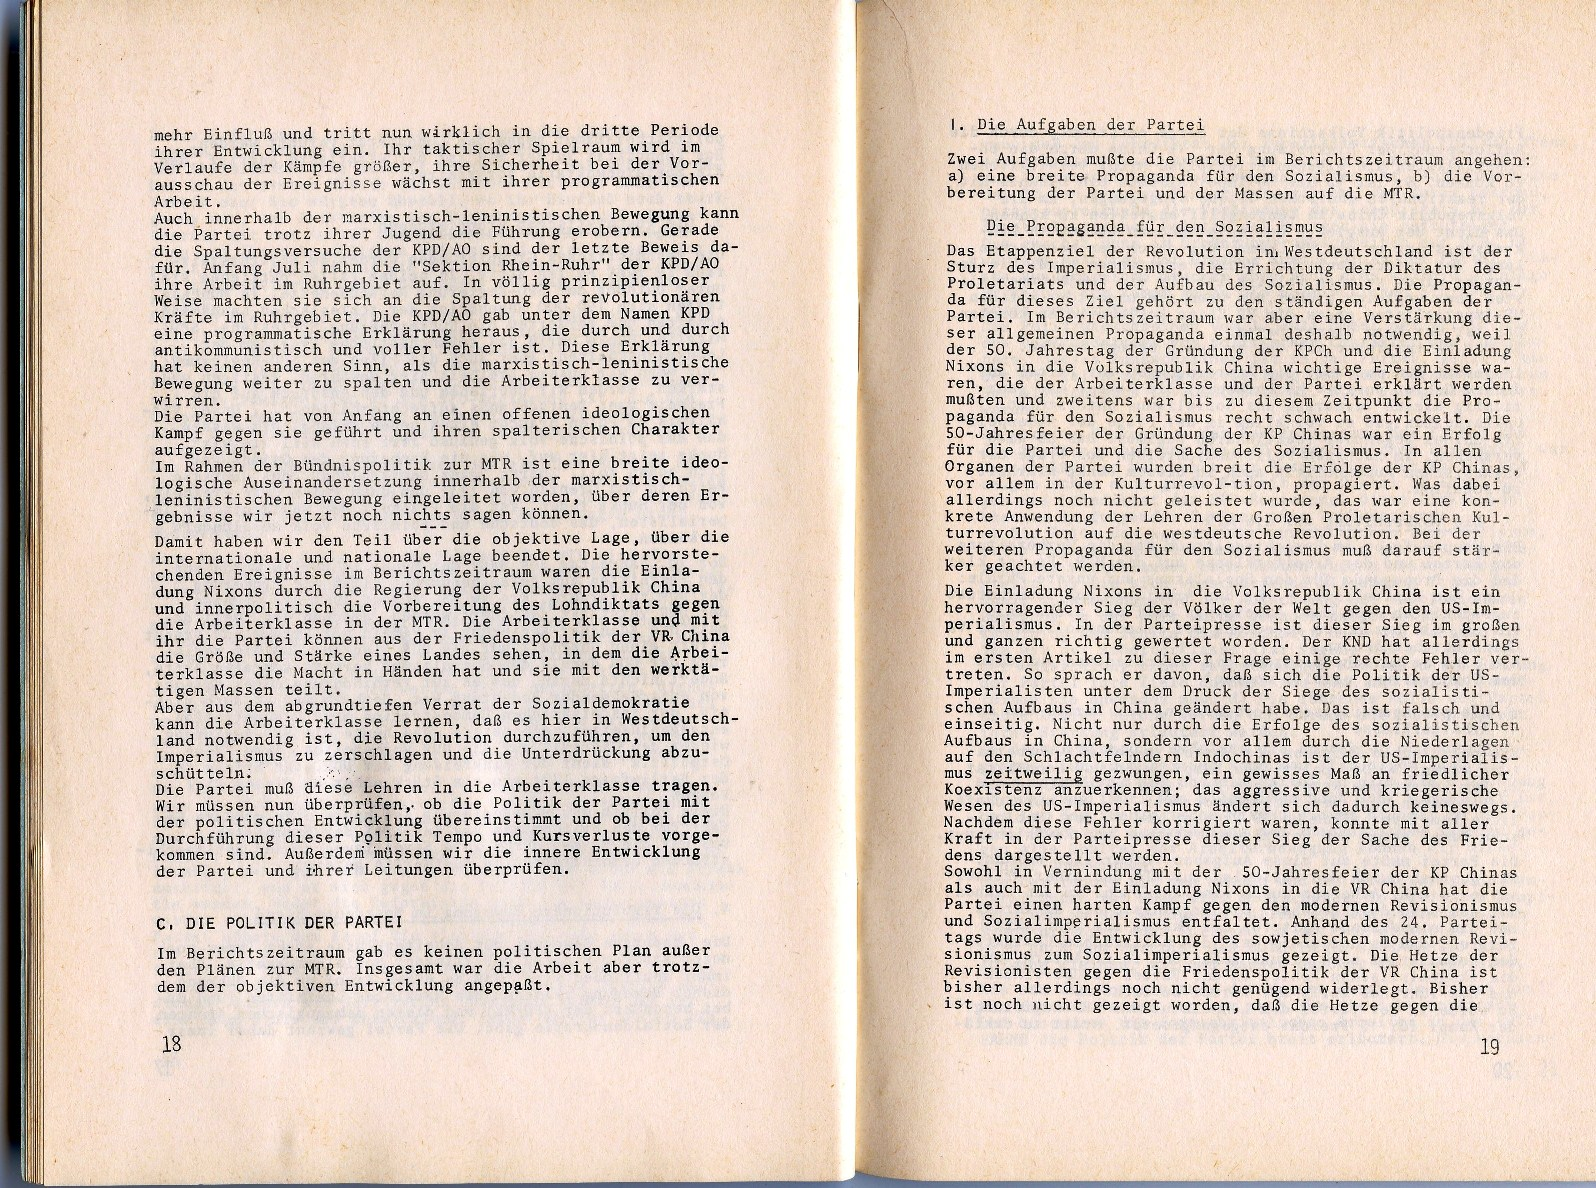 ZB_Parteiarbeiter_1971_07_11